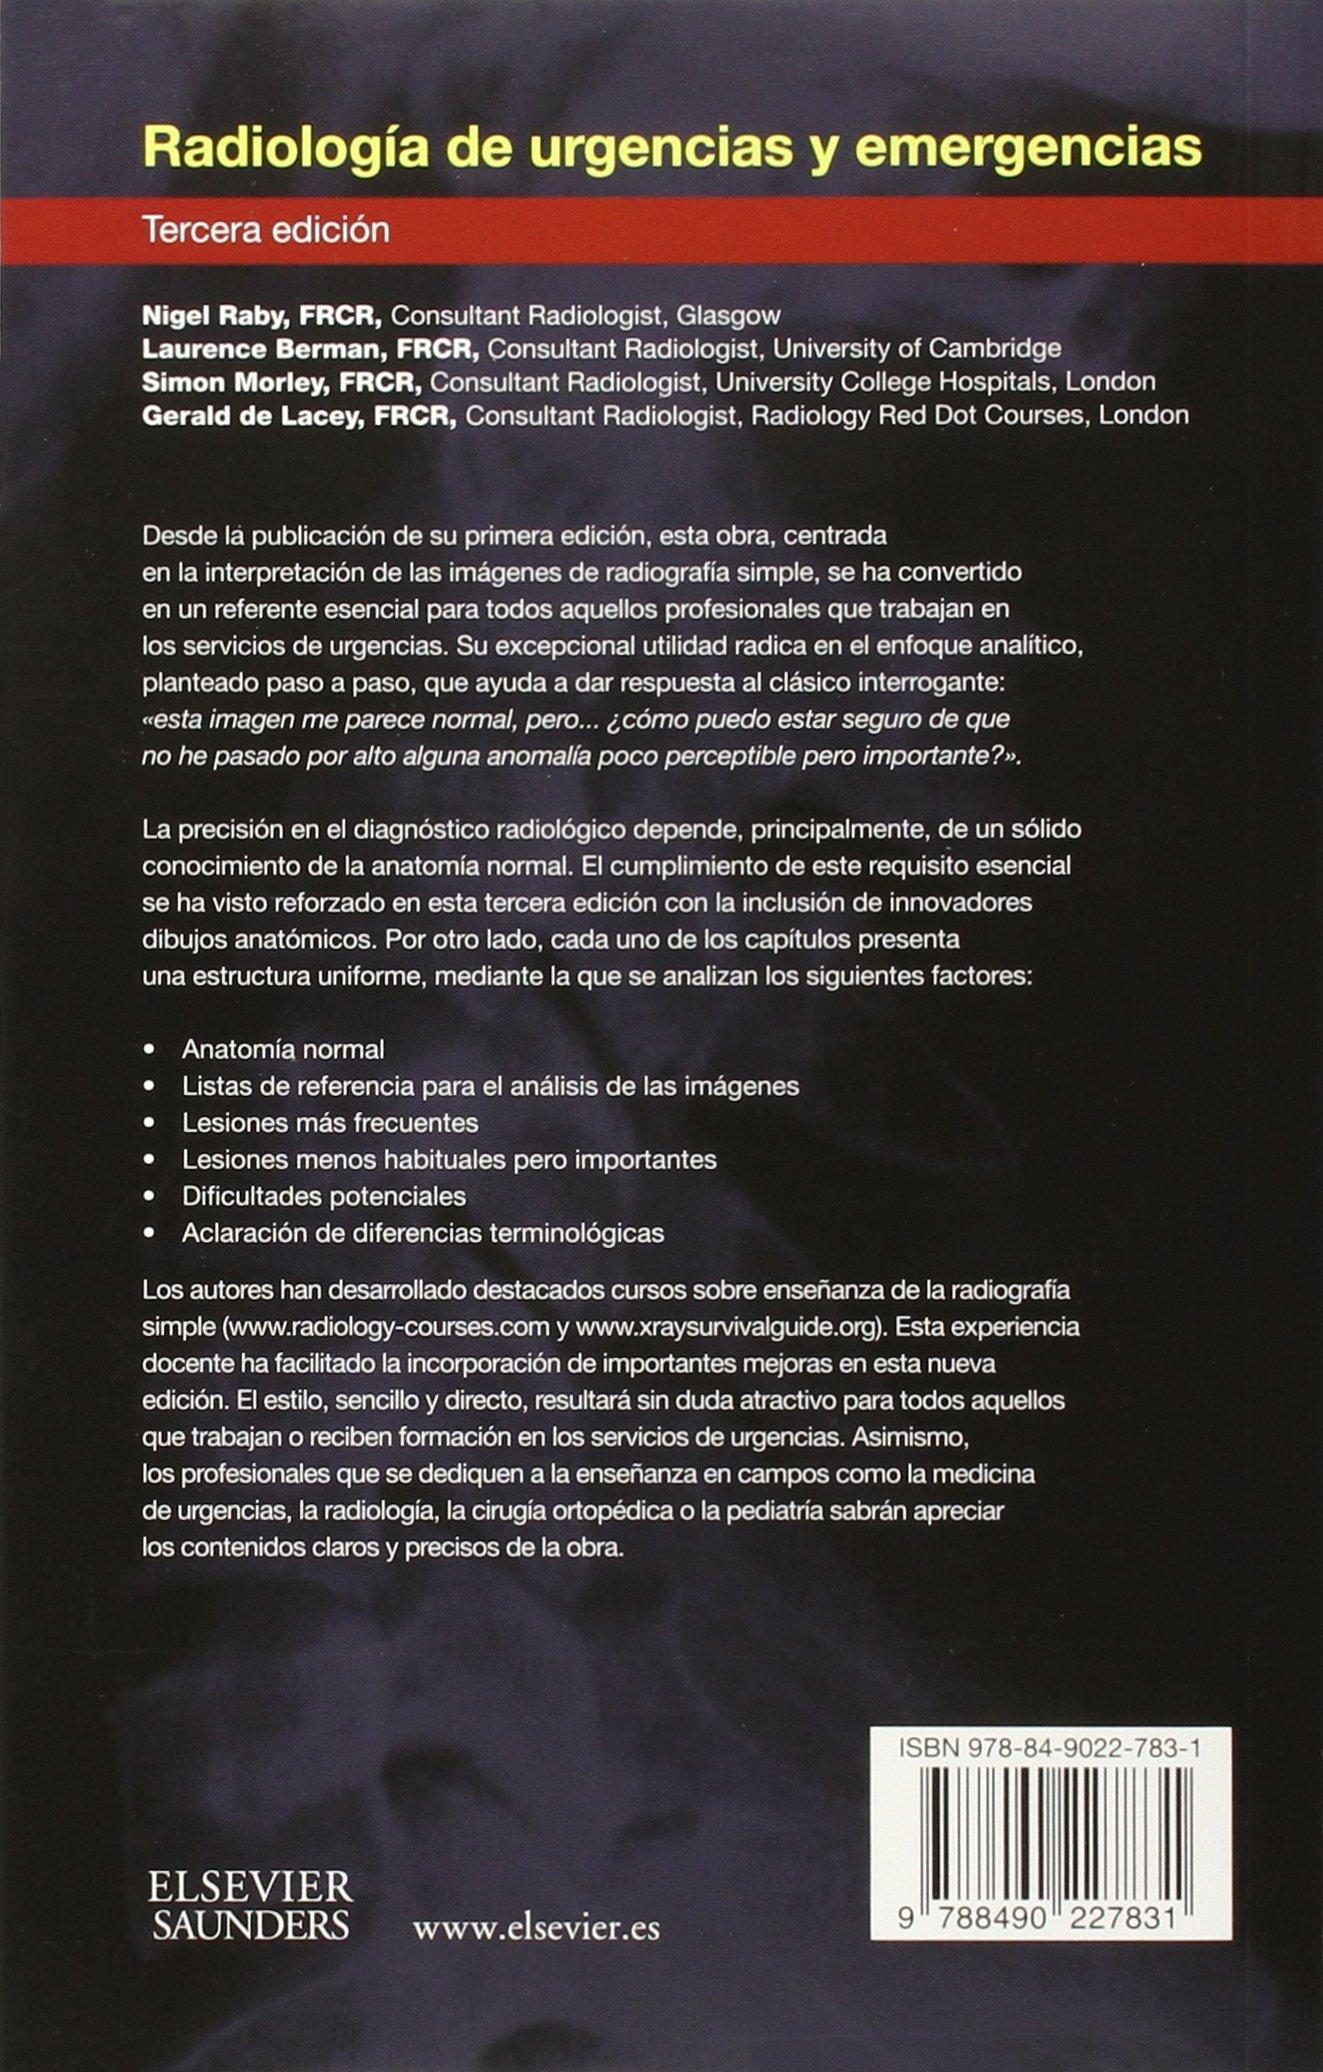 Radiologia de urgencias y emergencias (Spanish Edition): N. Raby ...